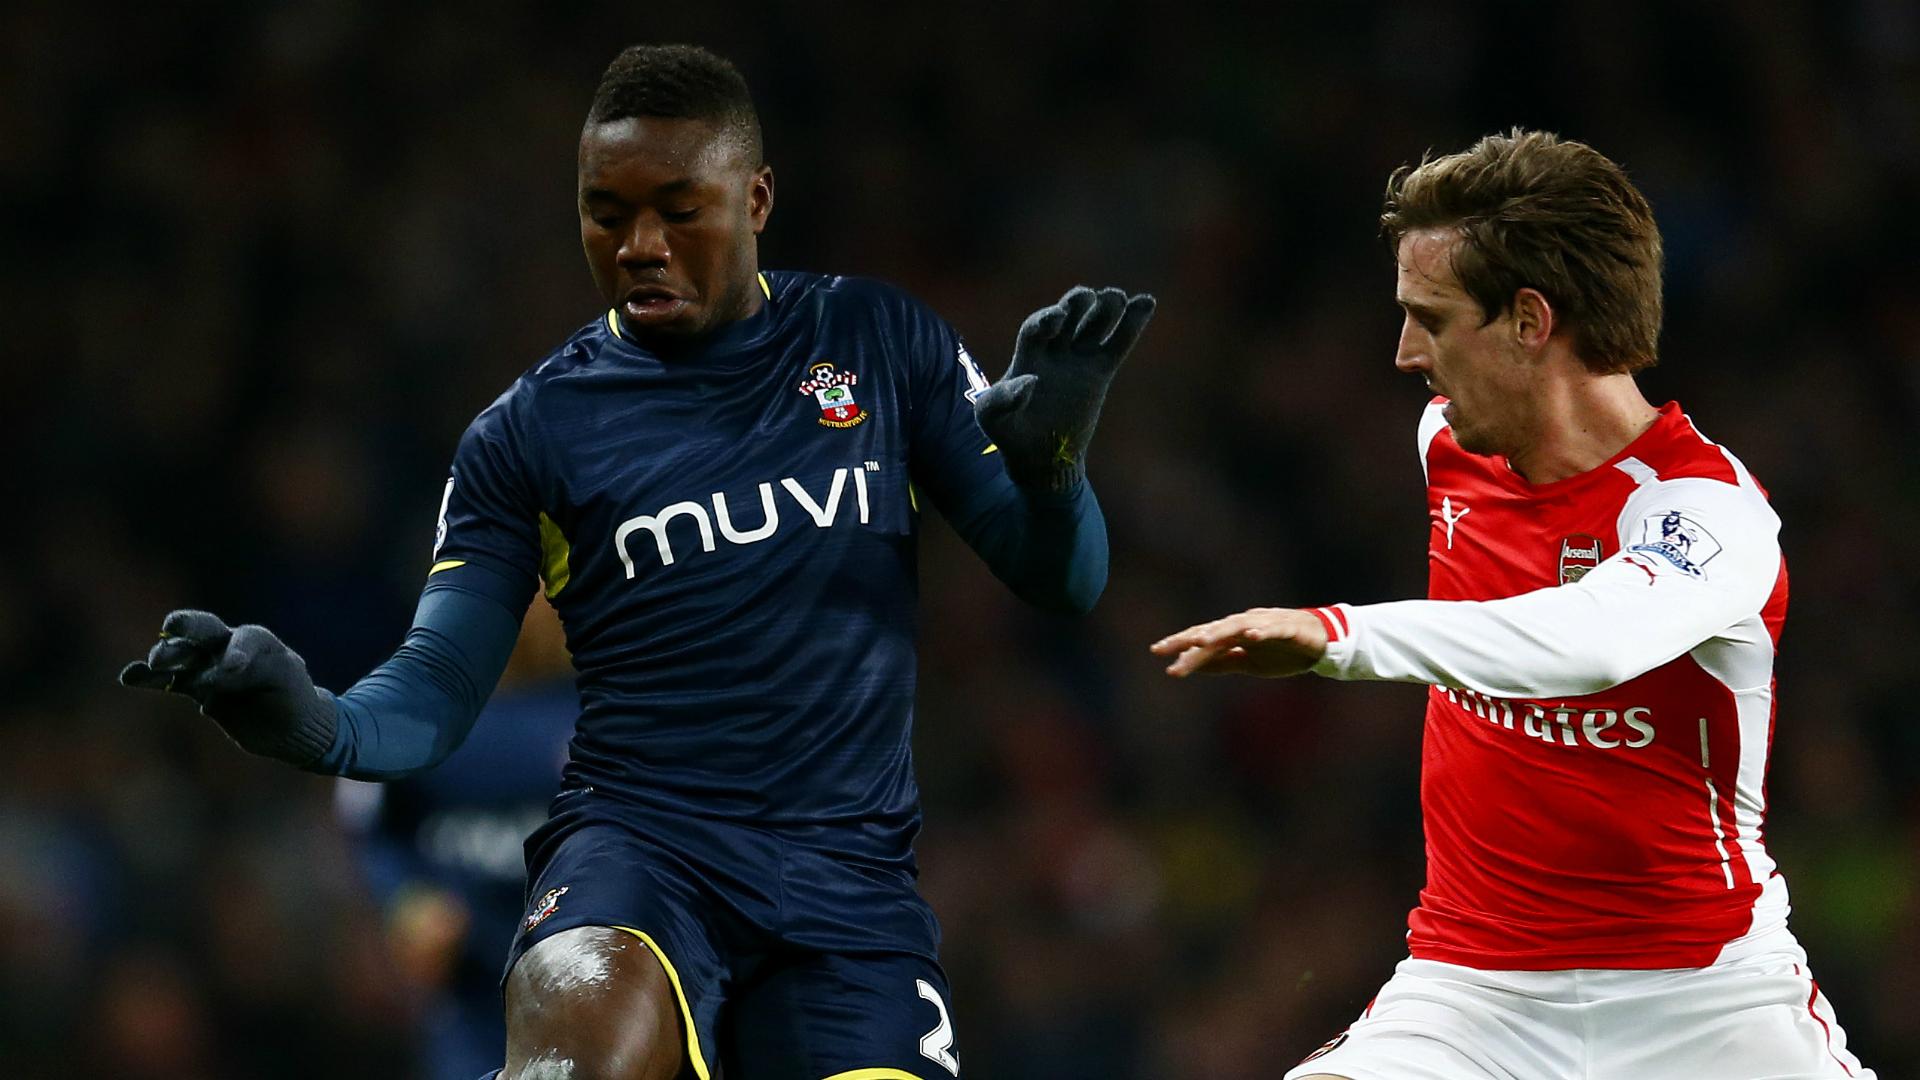 Emmanuel Mayuka Southampton Goal